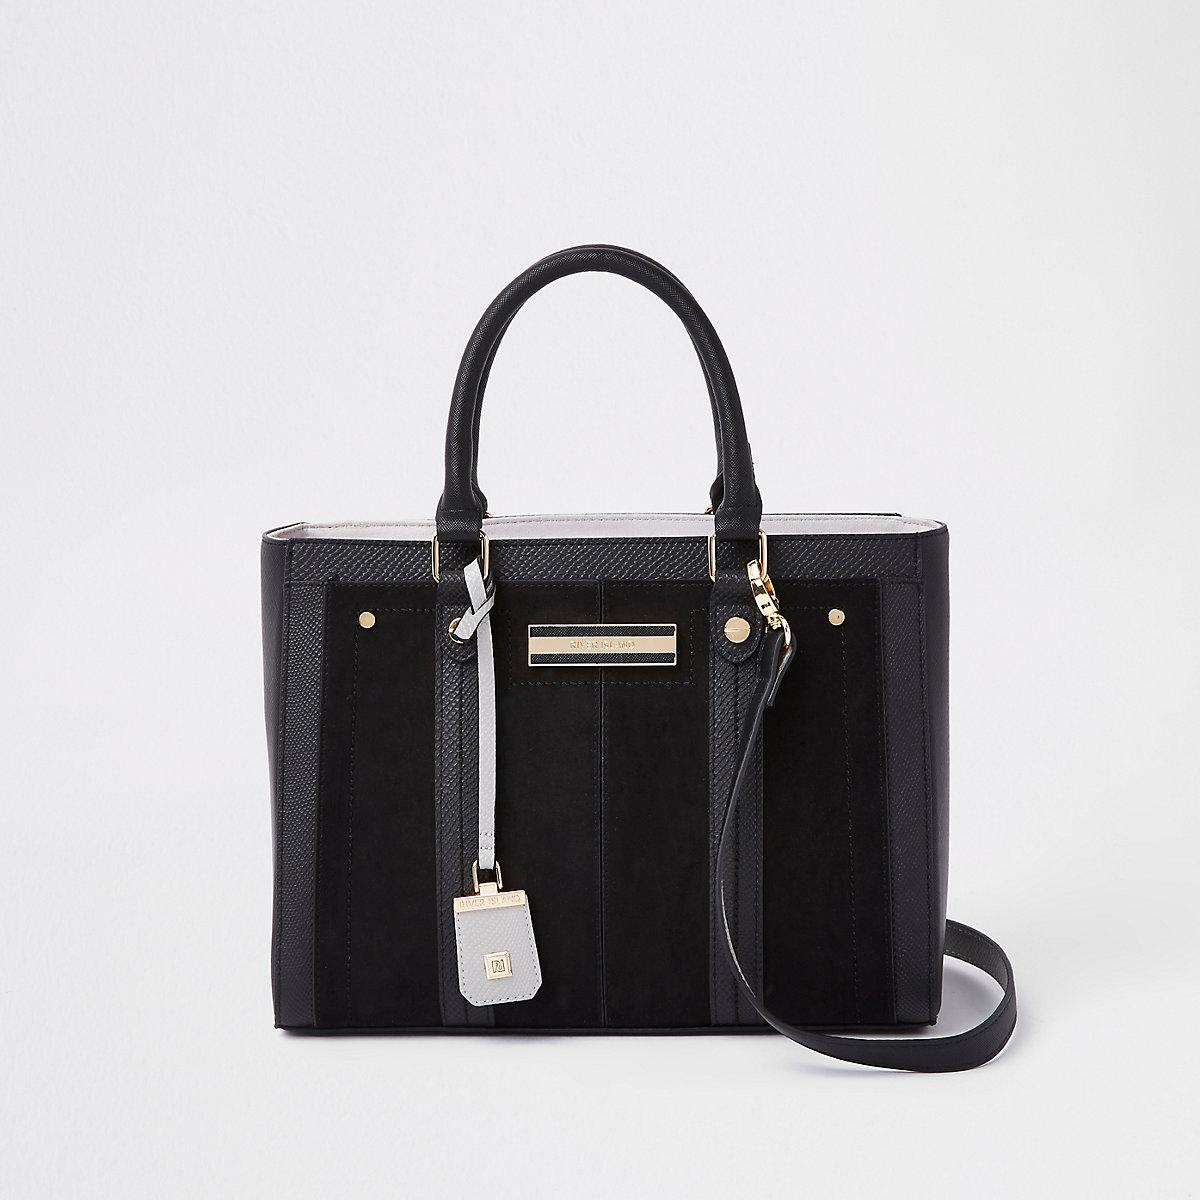 Black faux leather boxy tote bag